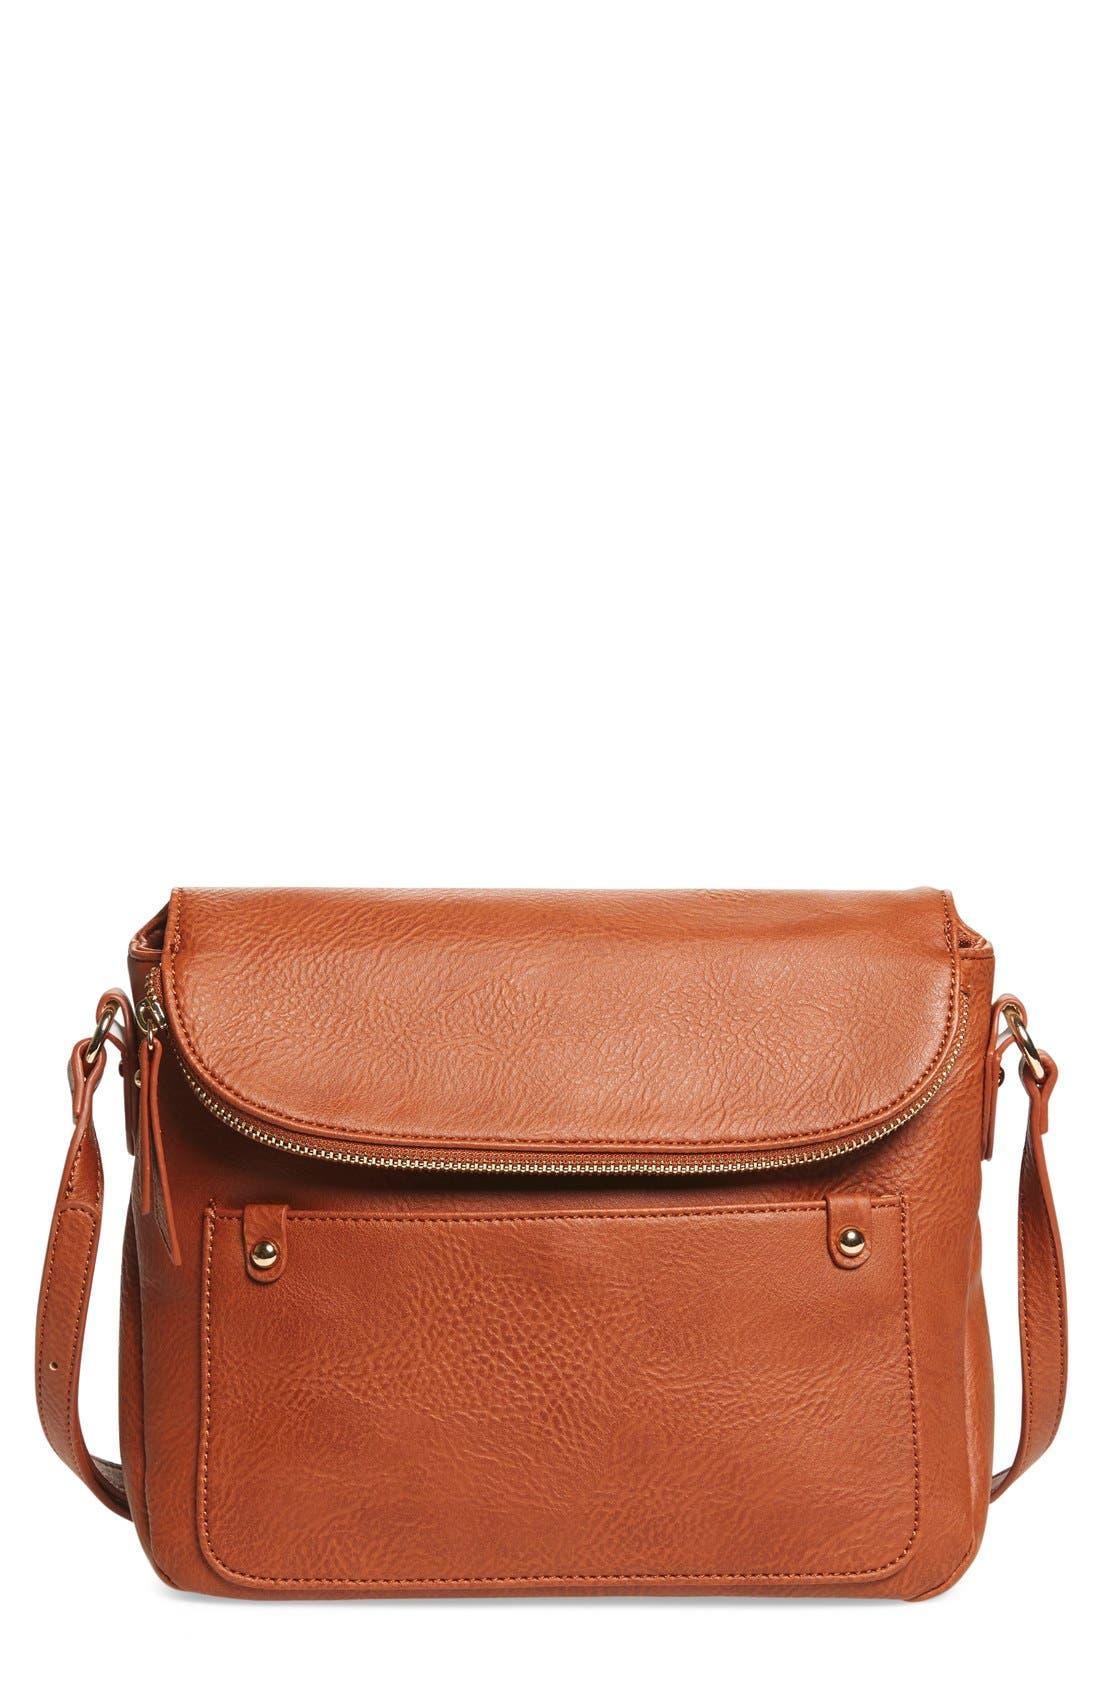 Zip Flap Faux Leather Crossbody Bag,                             Main thumbnail 2, color,